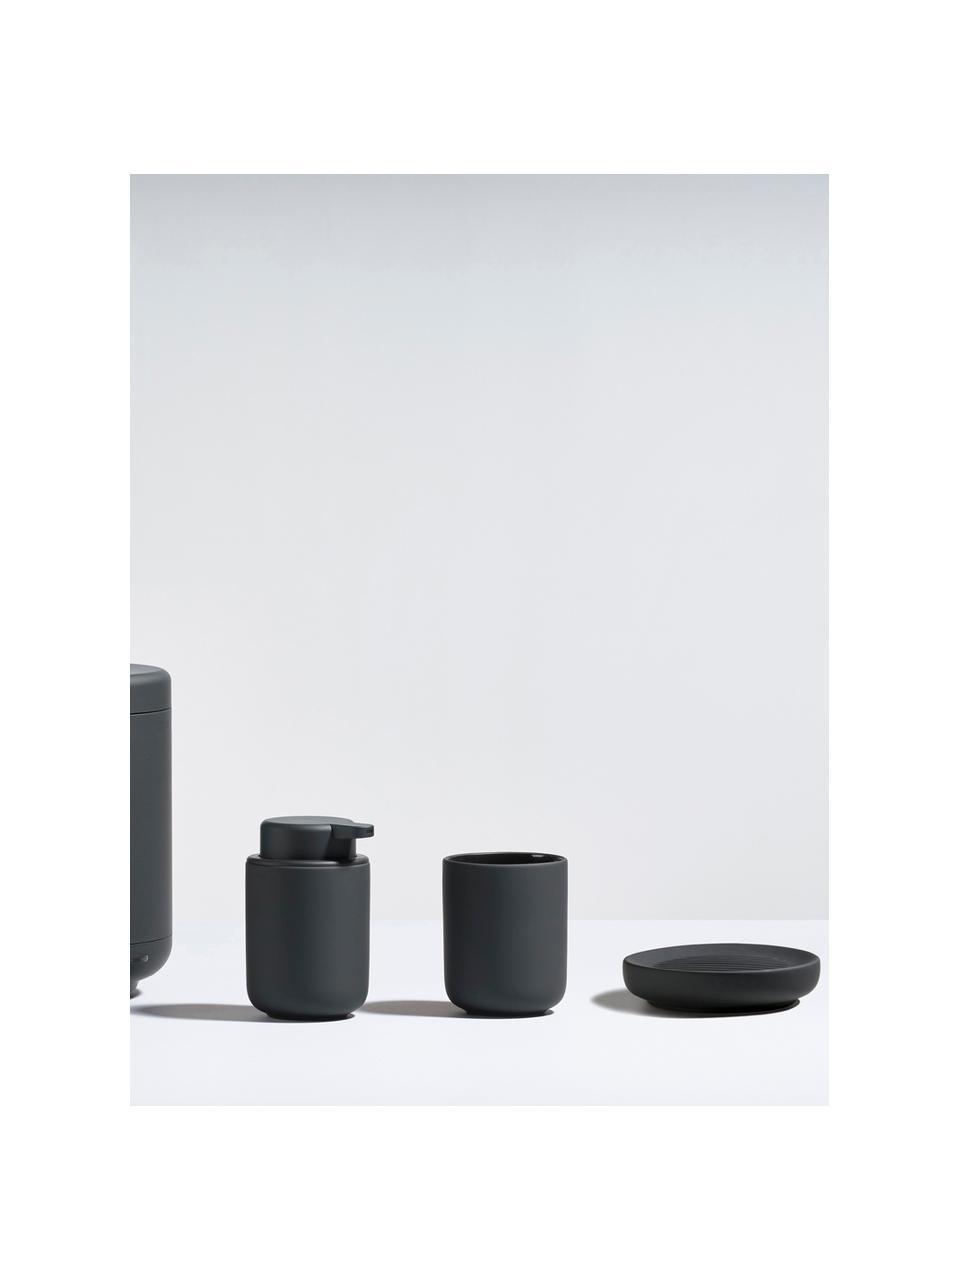 Porzellan-Seifenschale Ume, Porzellan, Schwarz, Ø 12 x H 3 cm